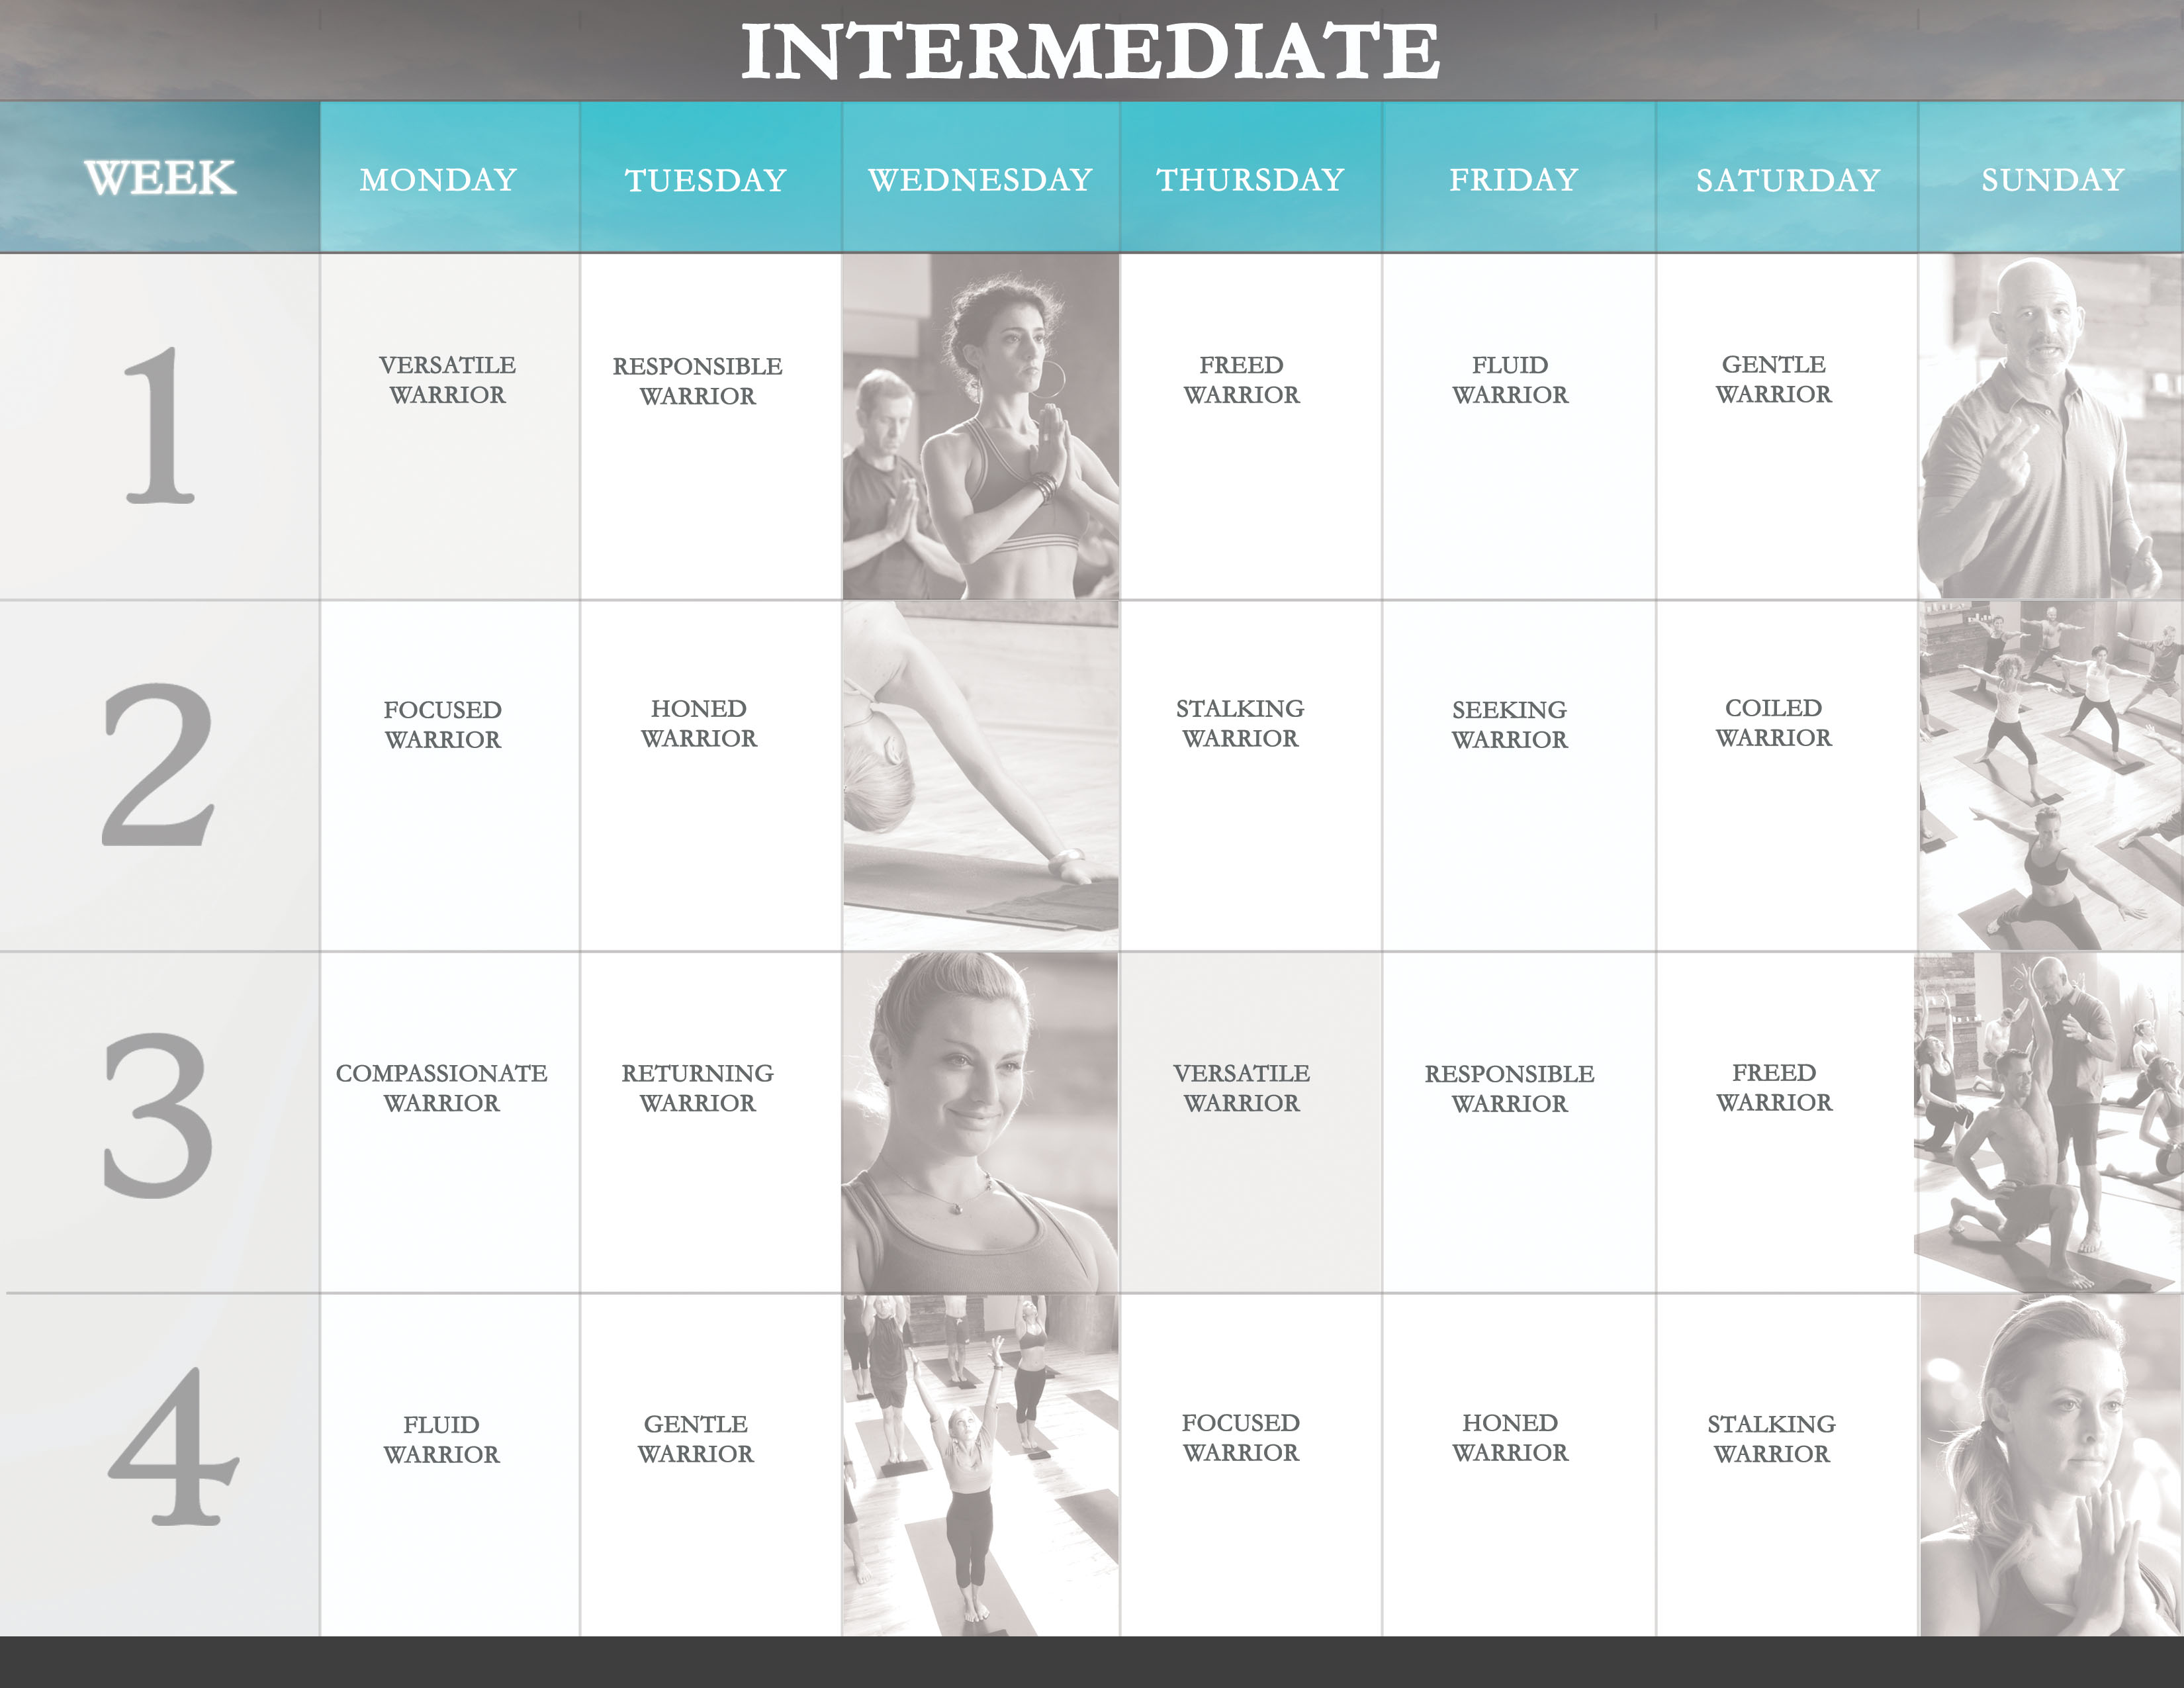 YW_intermediate_cal-1